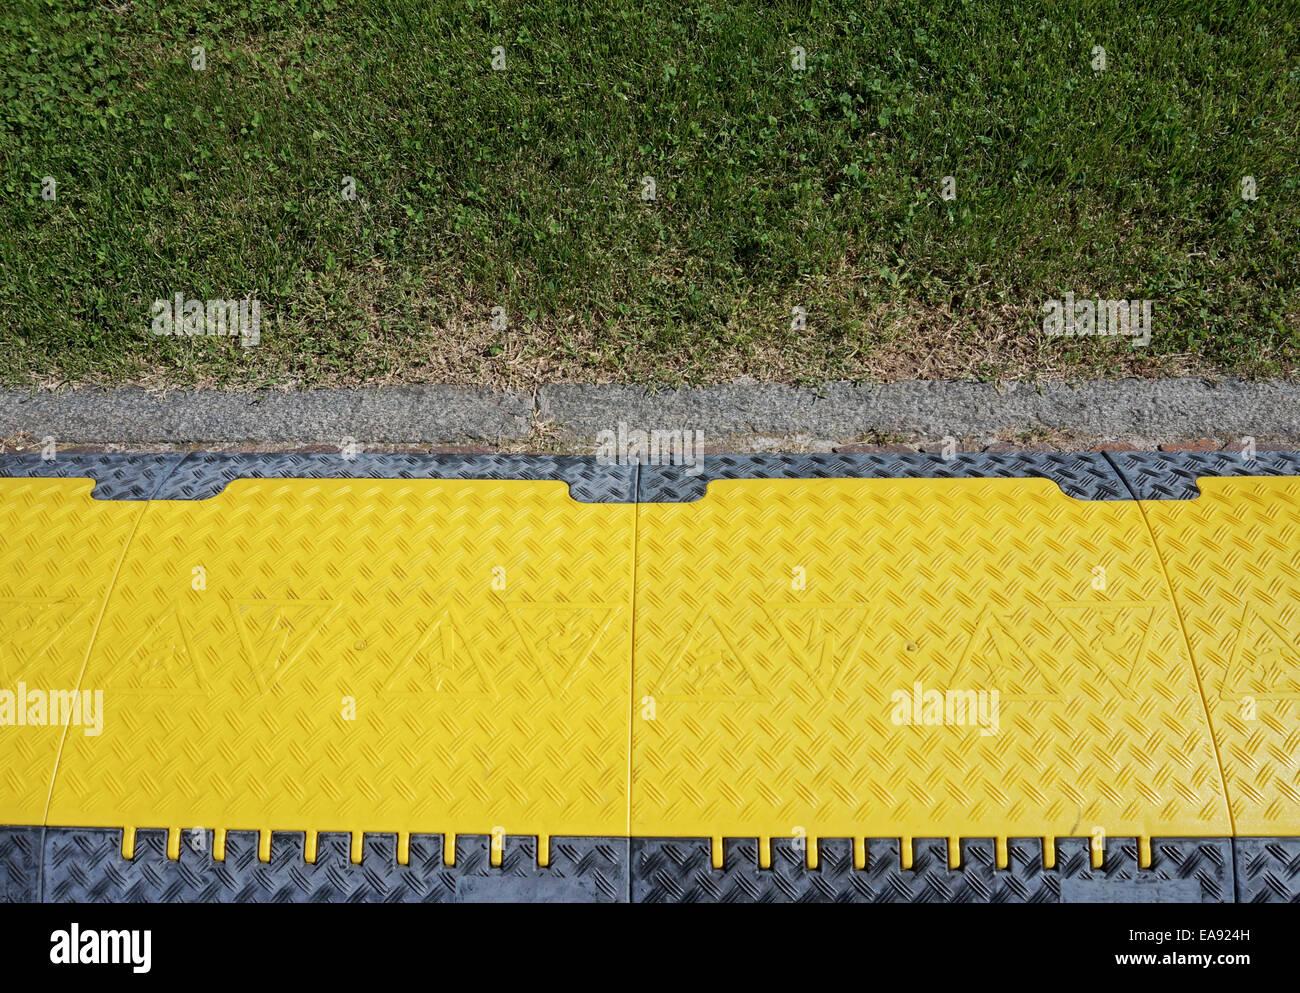 disabled ramp facilities - Stock Image